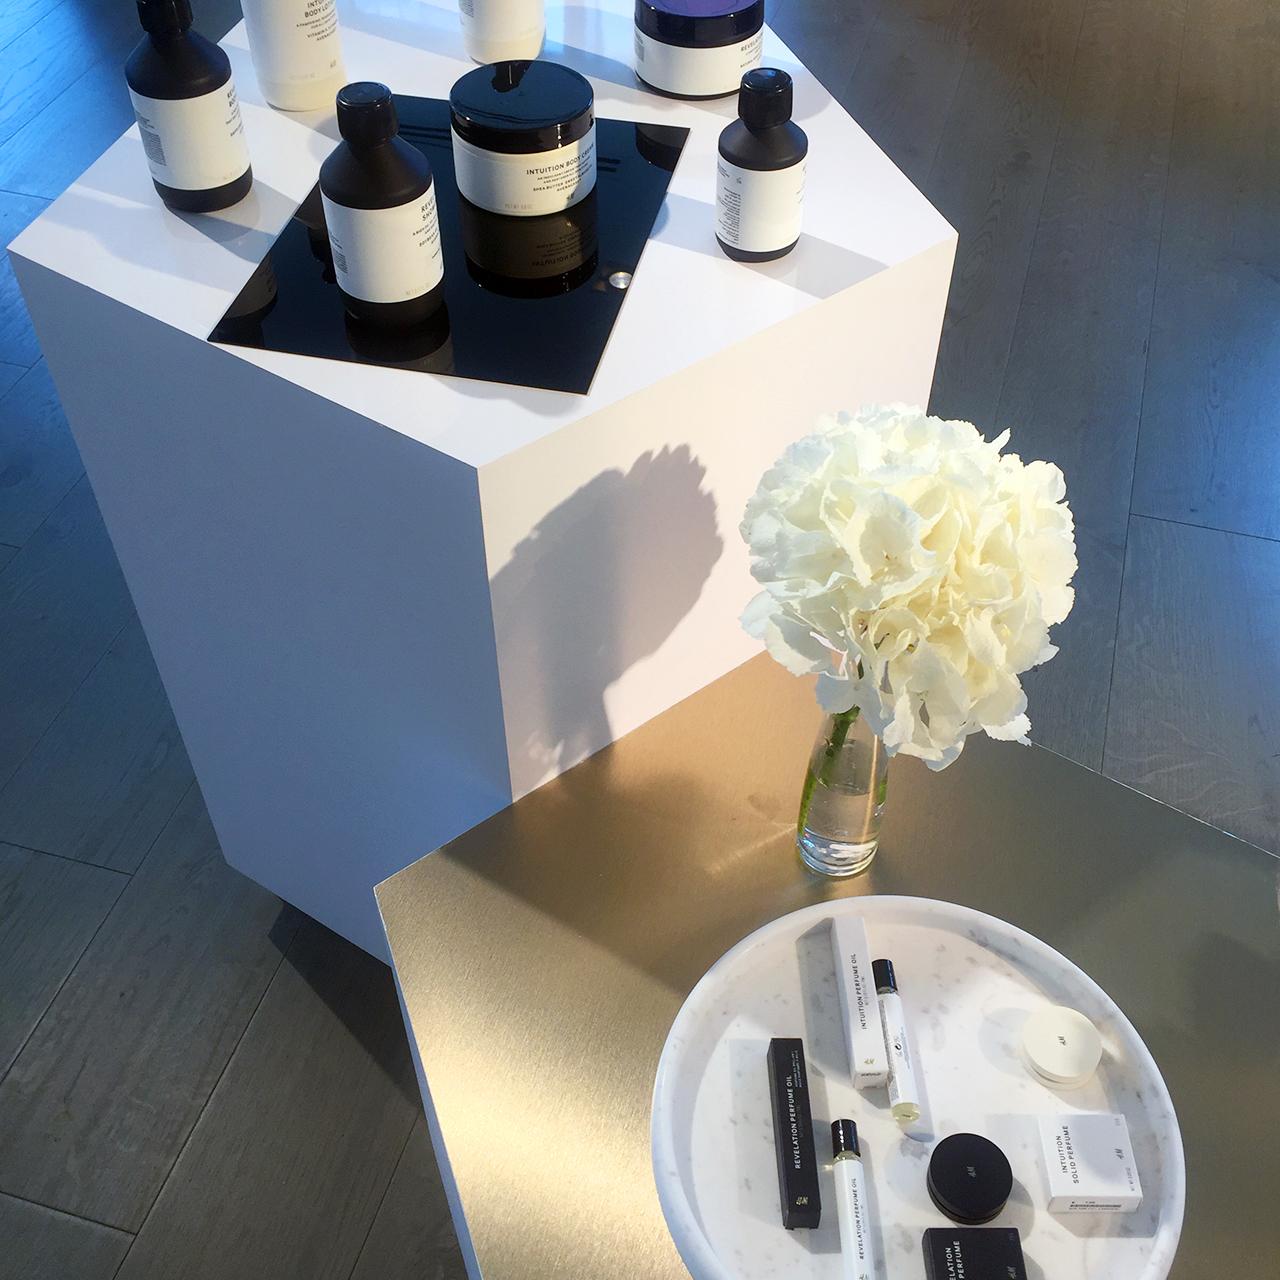 h&m-bodycare-fragrances